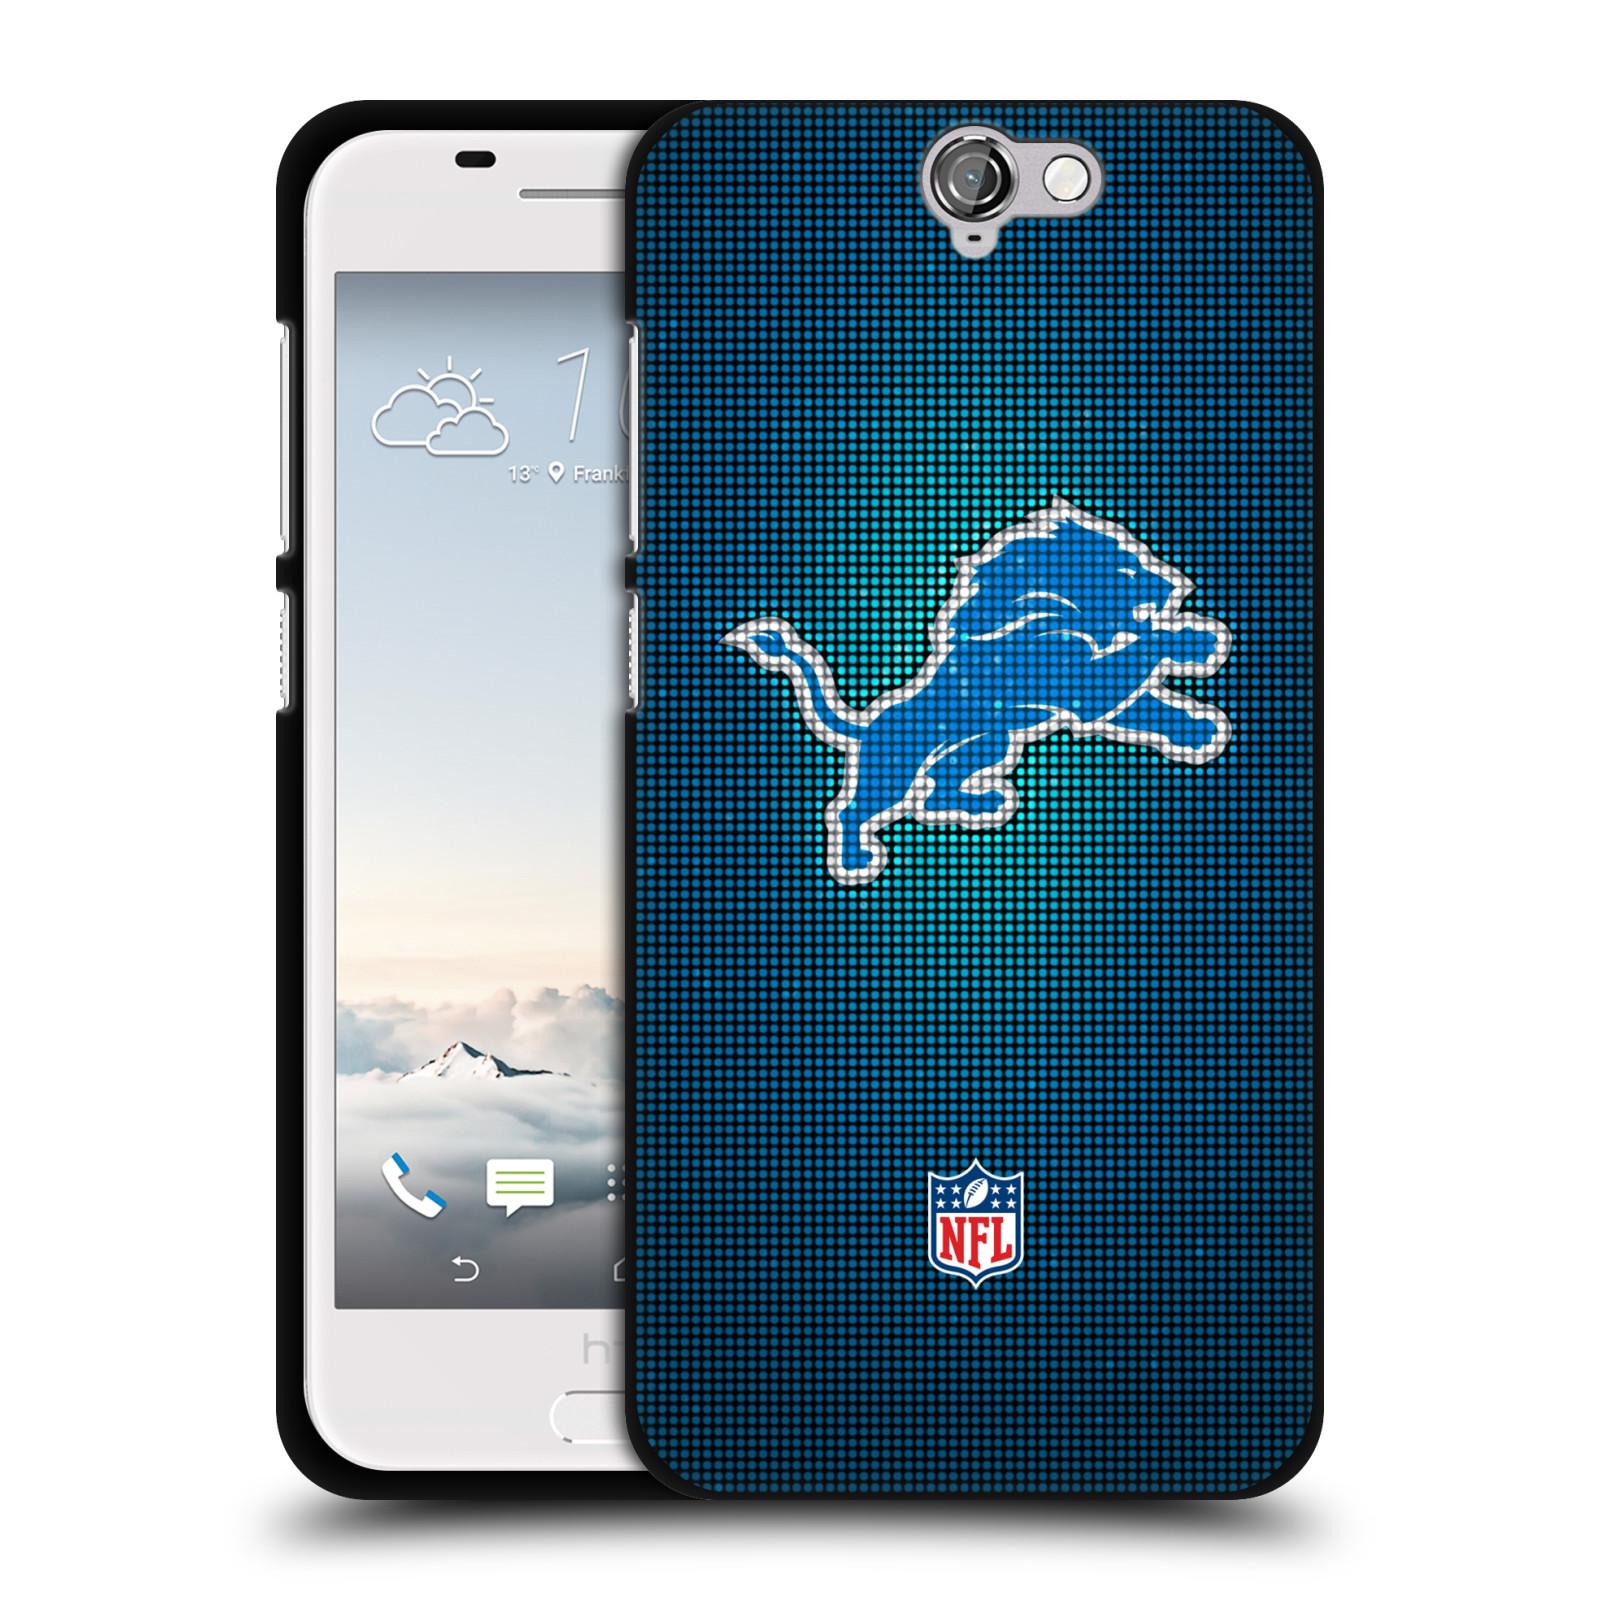 OFFICIAL-NFL-2017-18-DETROIT-LIONS-BLACK-SOFT-GEL-CASE-FOR-HTC-PHONES